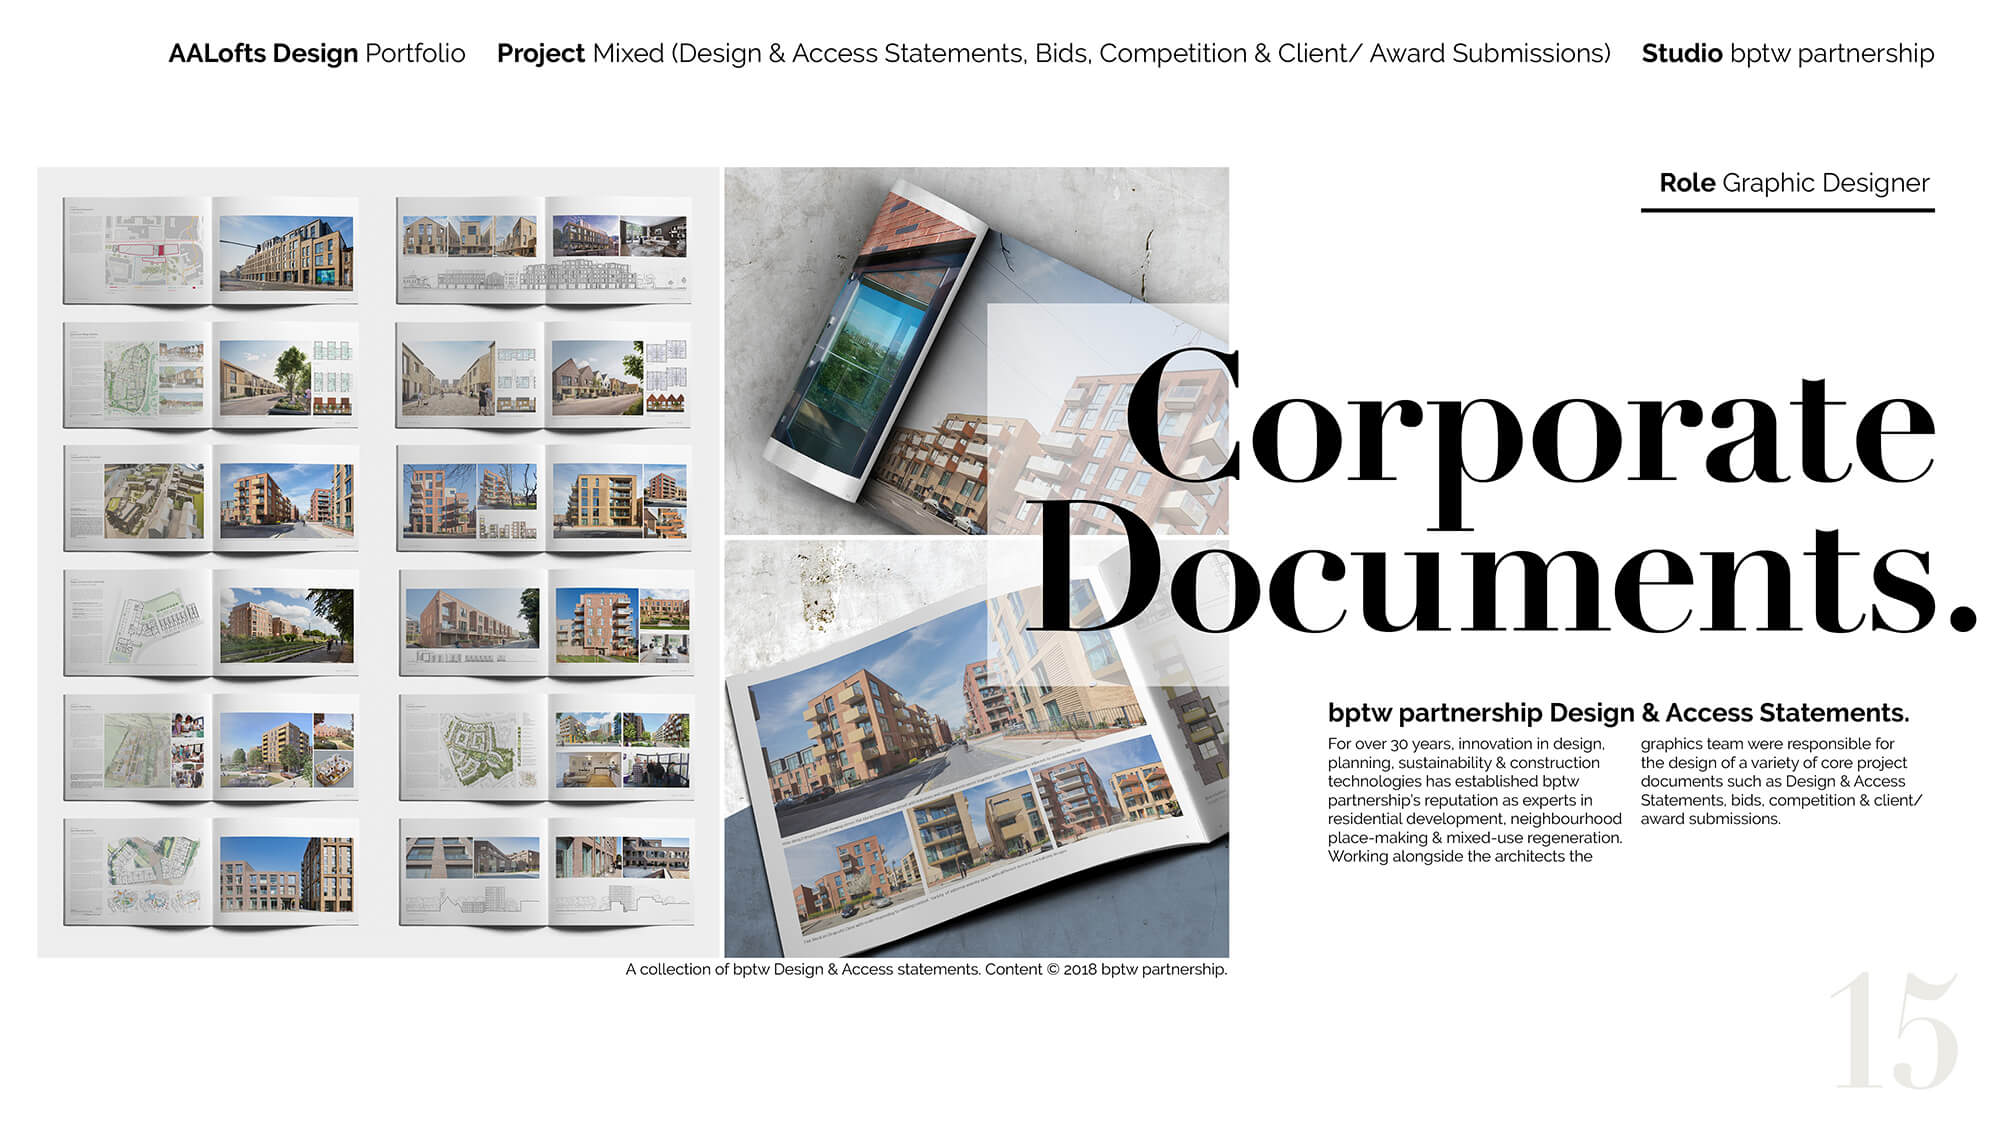 2021_AALOFTS DESIGN PORTFOLIO_Page_15